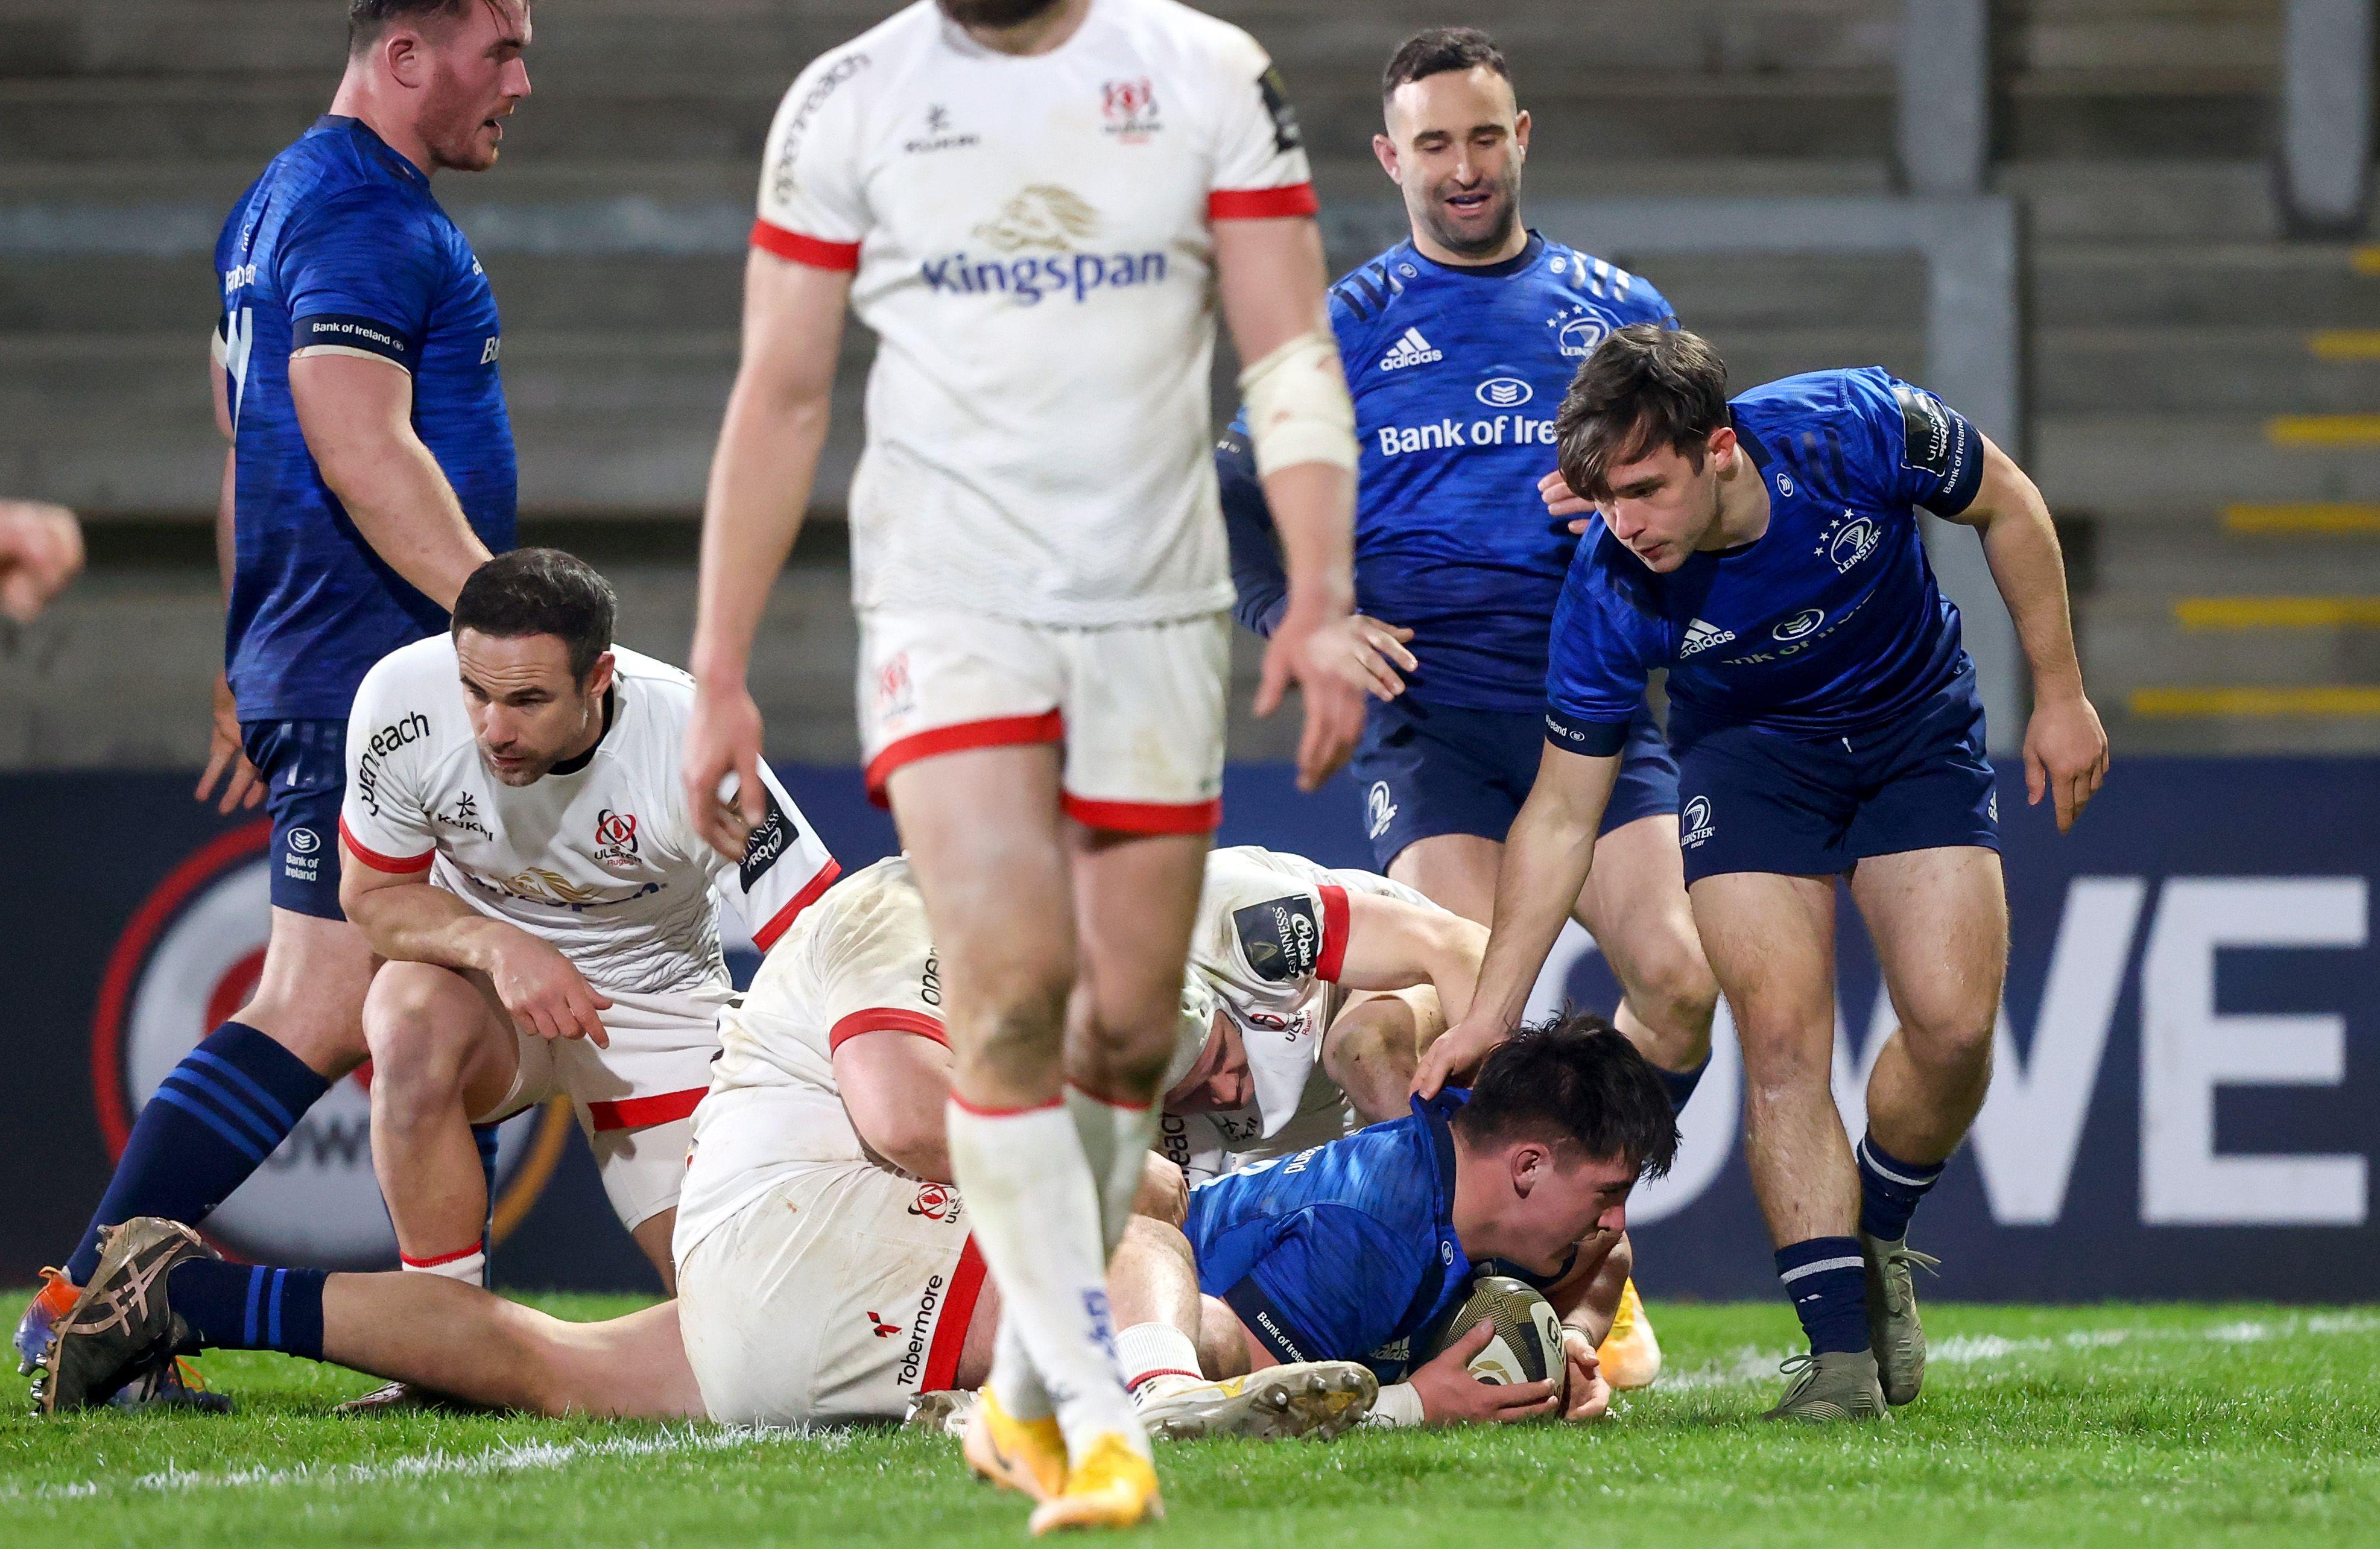 Dan Sheehan crosses for a Leinster try